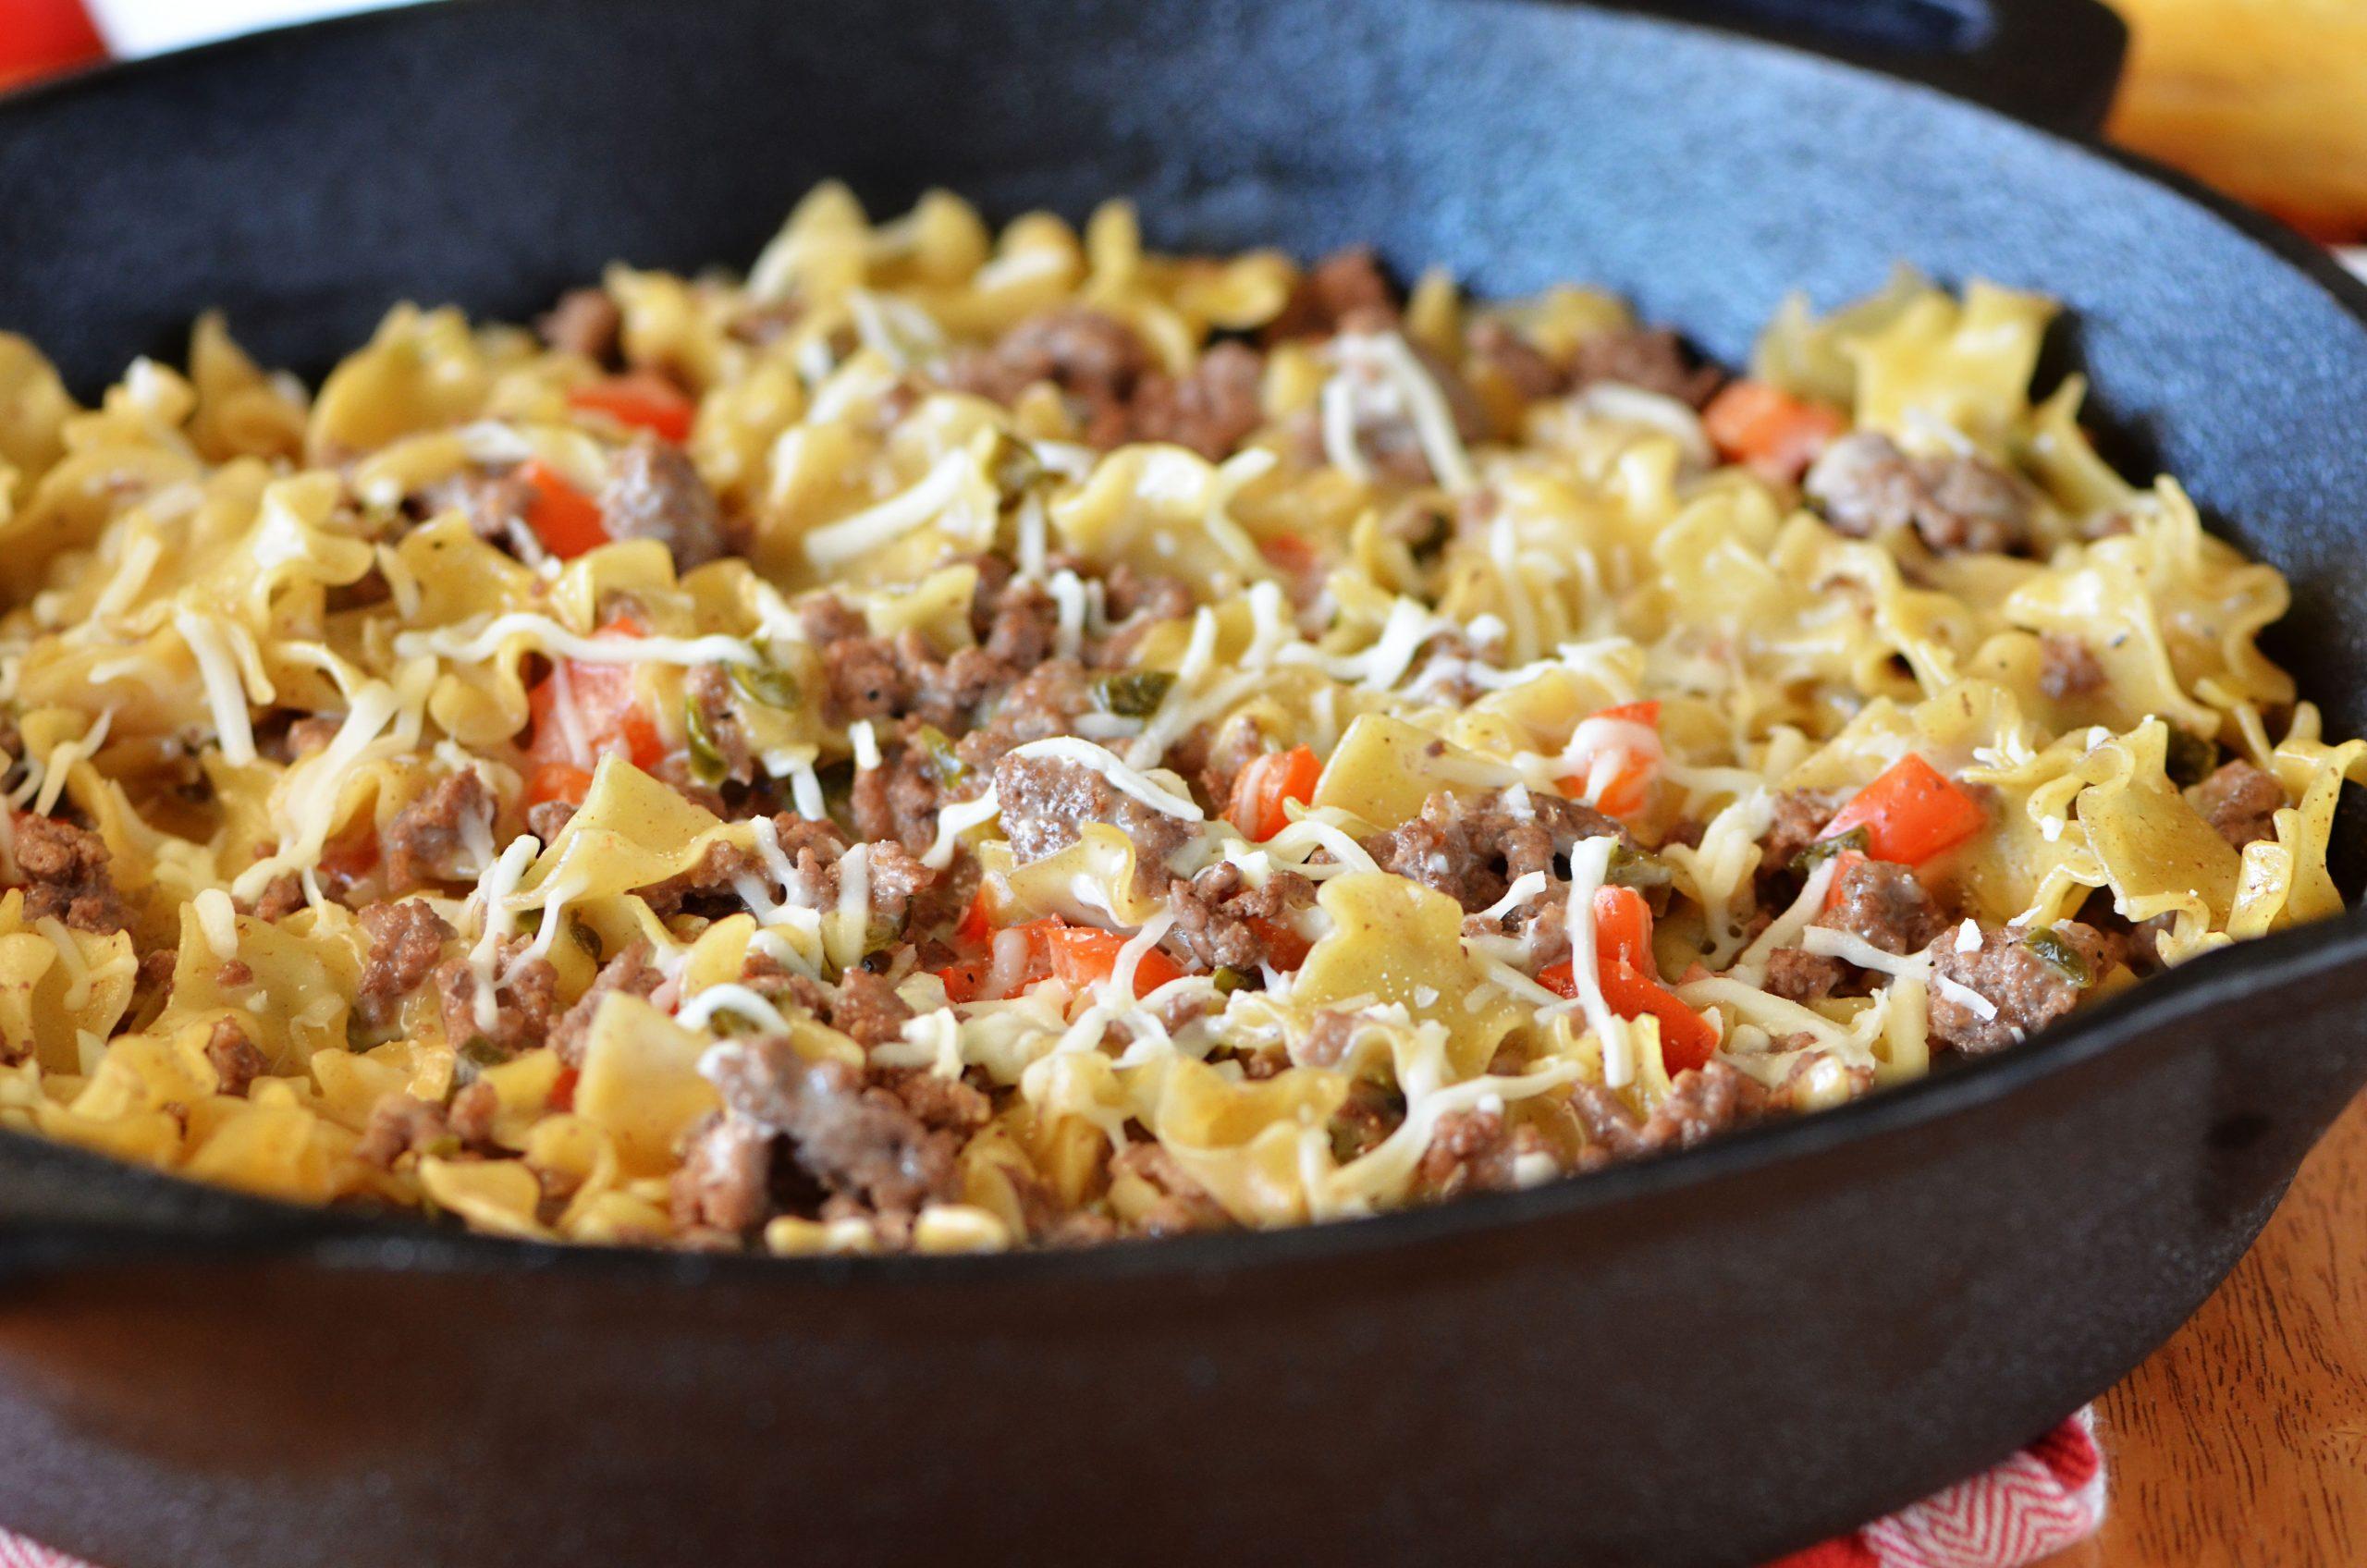 Velveeta cheesy pasta recipe